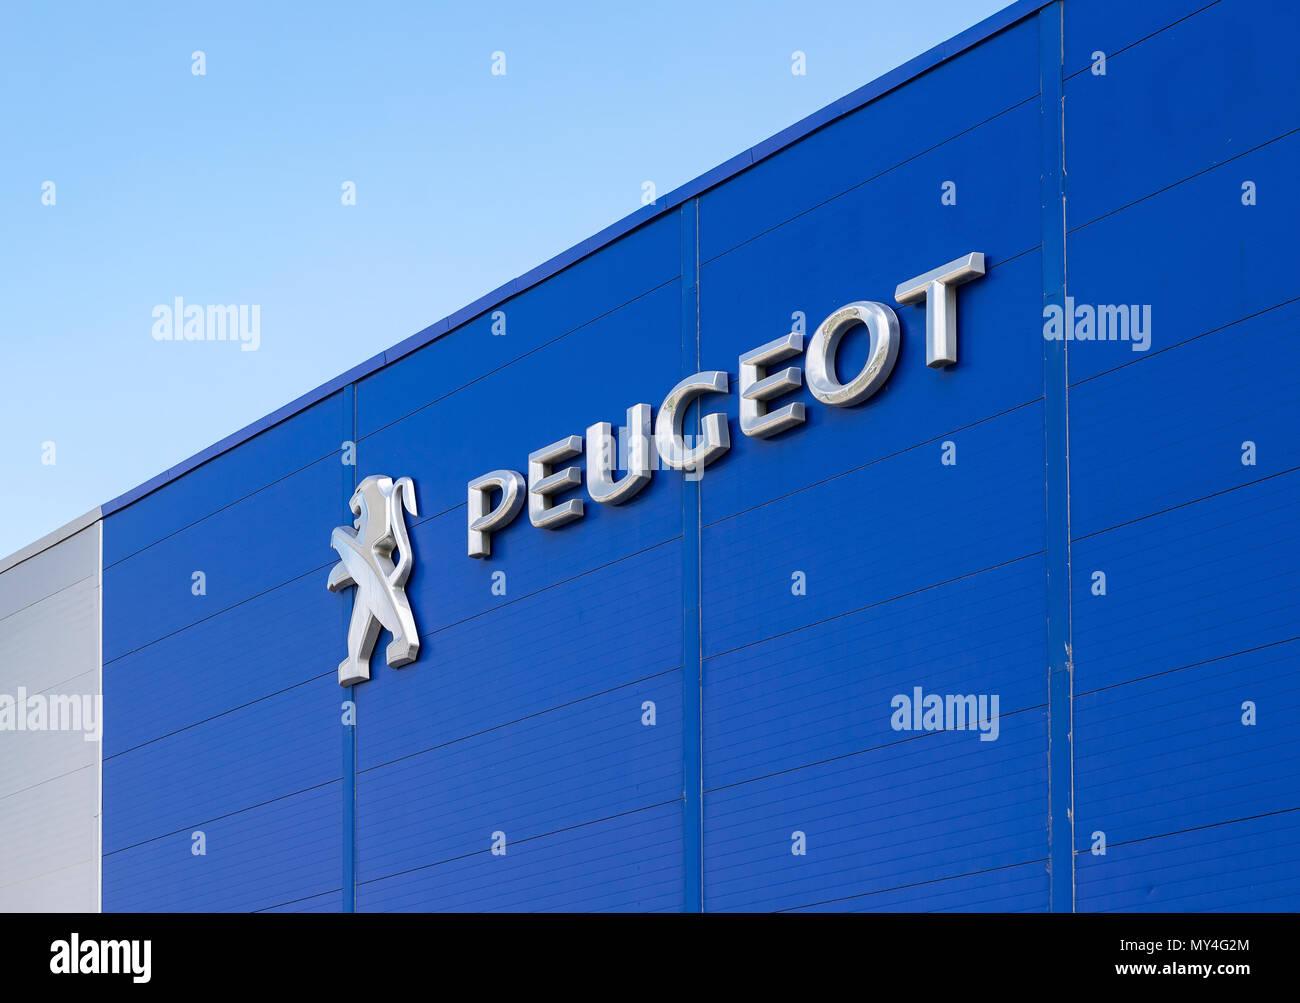 Psa Peugeot Citroen Stock Photos Amp Psa Peugeot Citroen